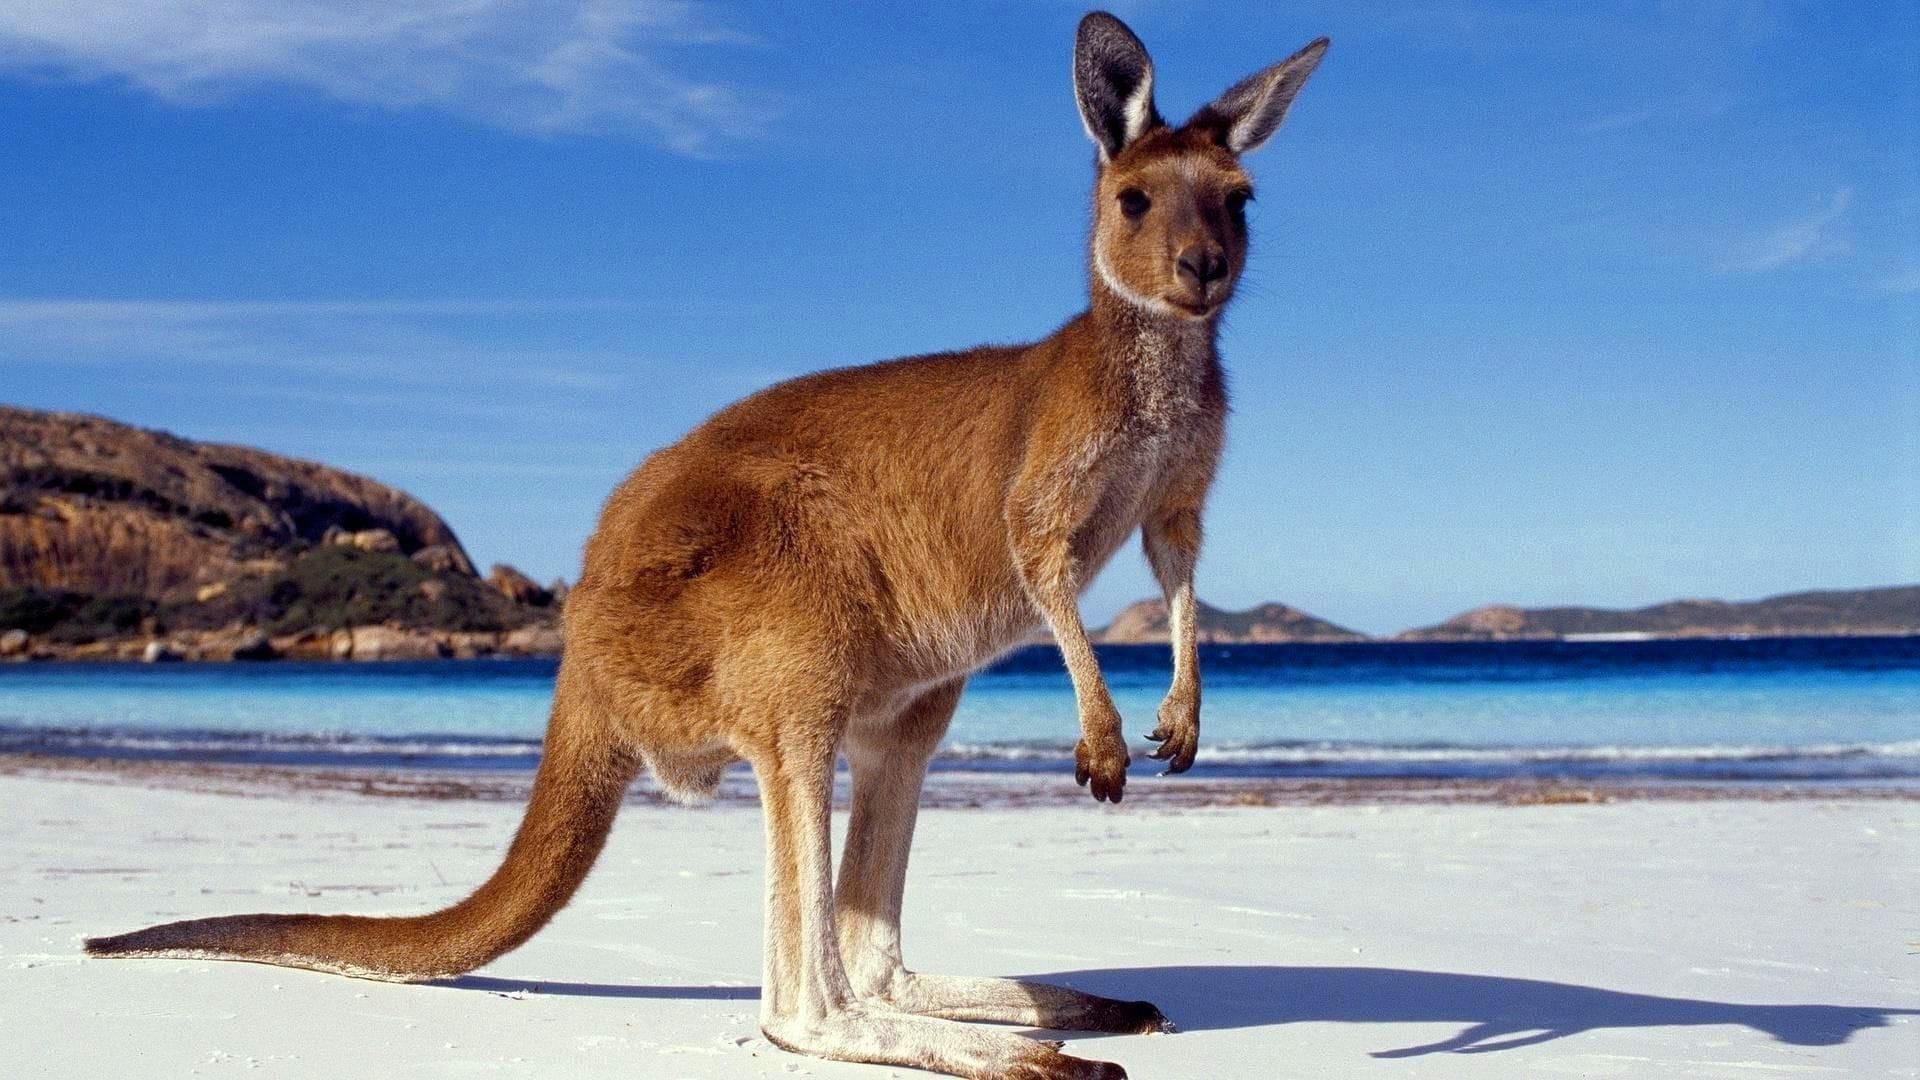 kangaroo dream meaning, dream about kangaroo, kangaroo dream interpretation, seeing in a dream kangaroo